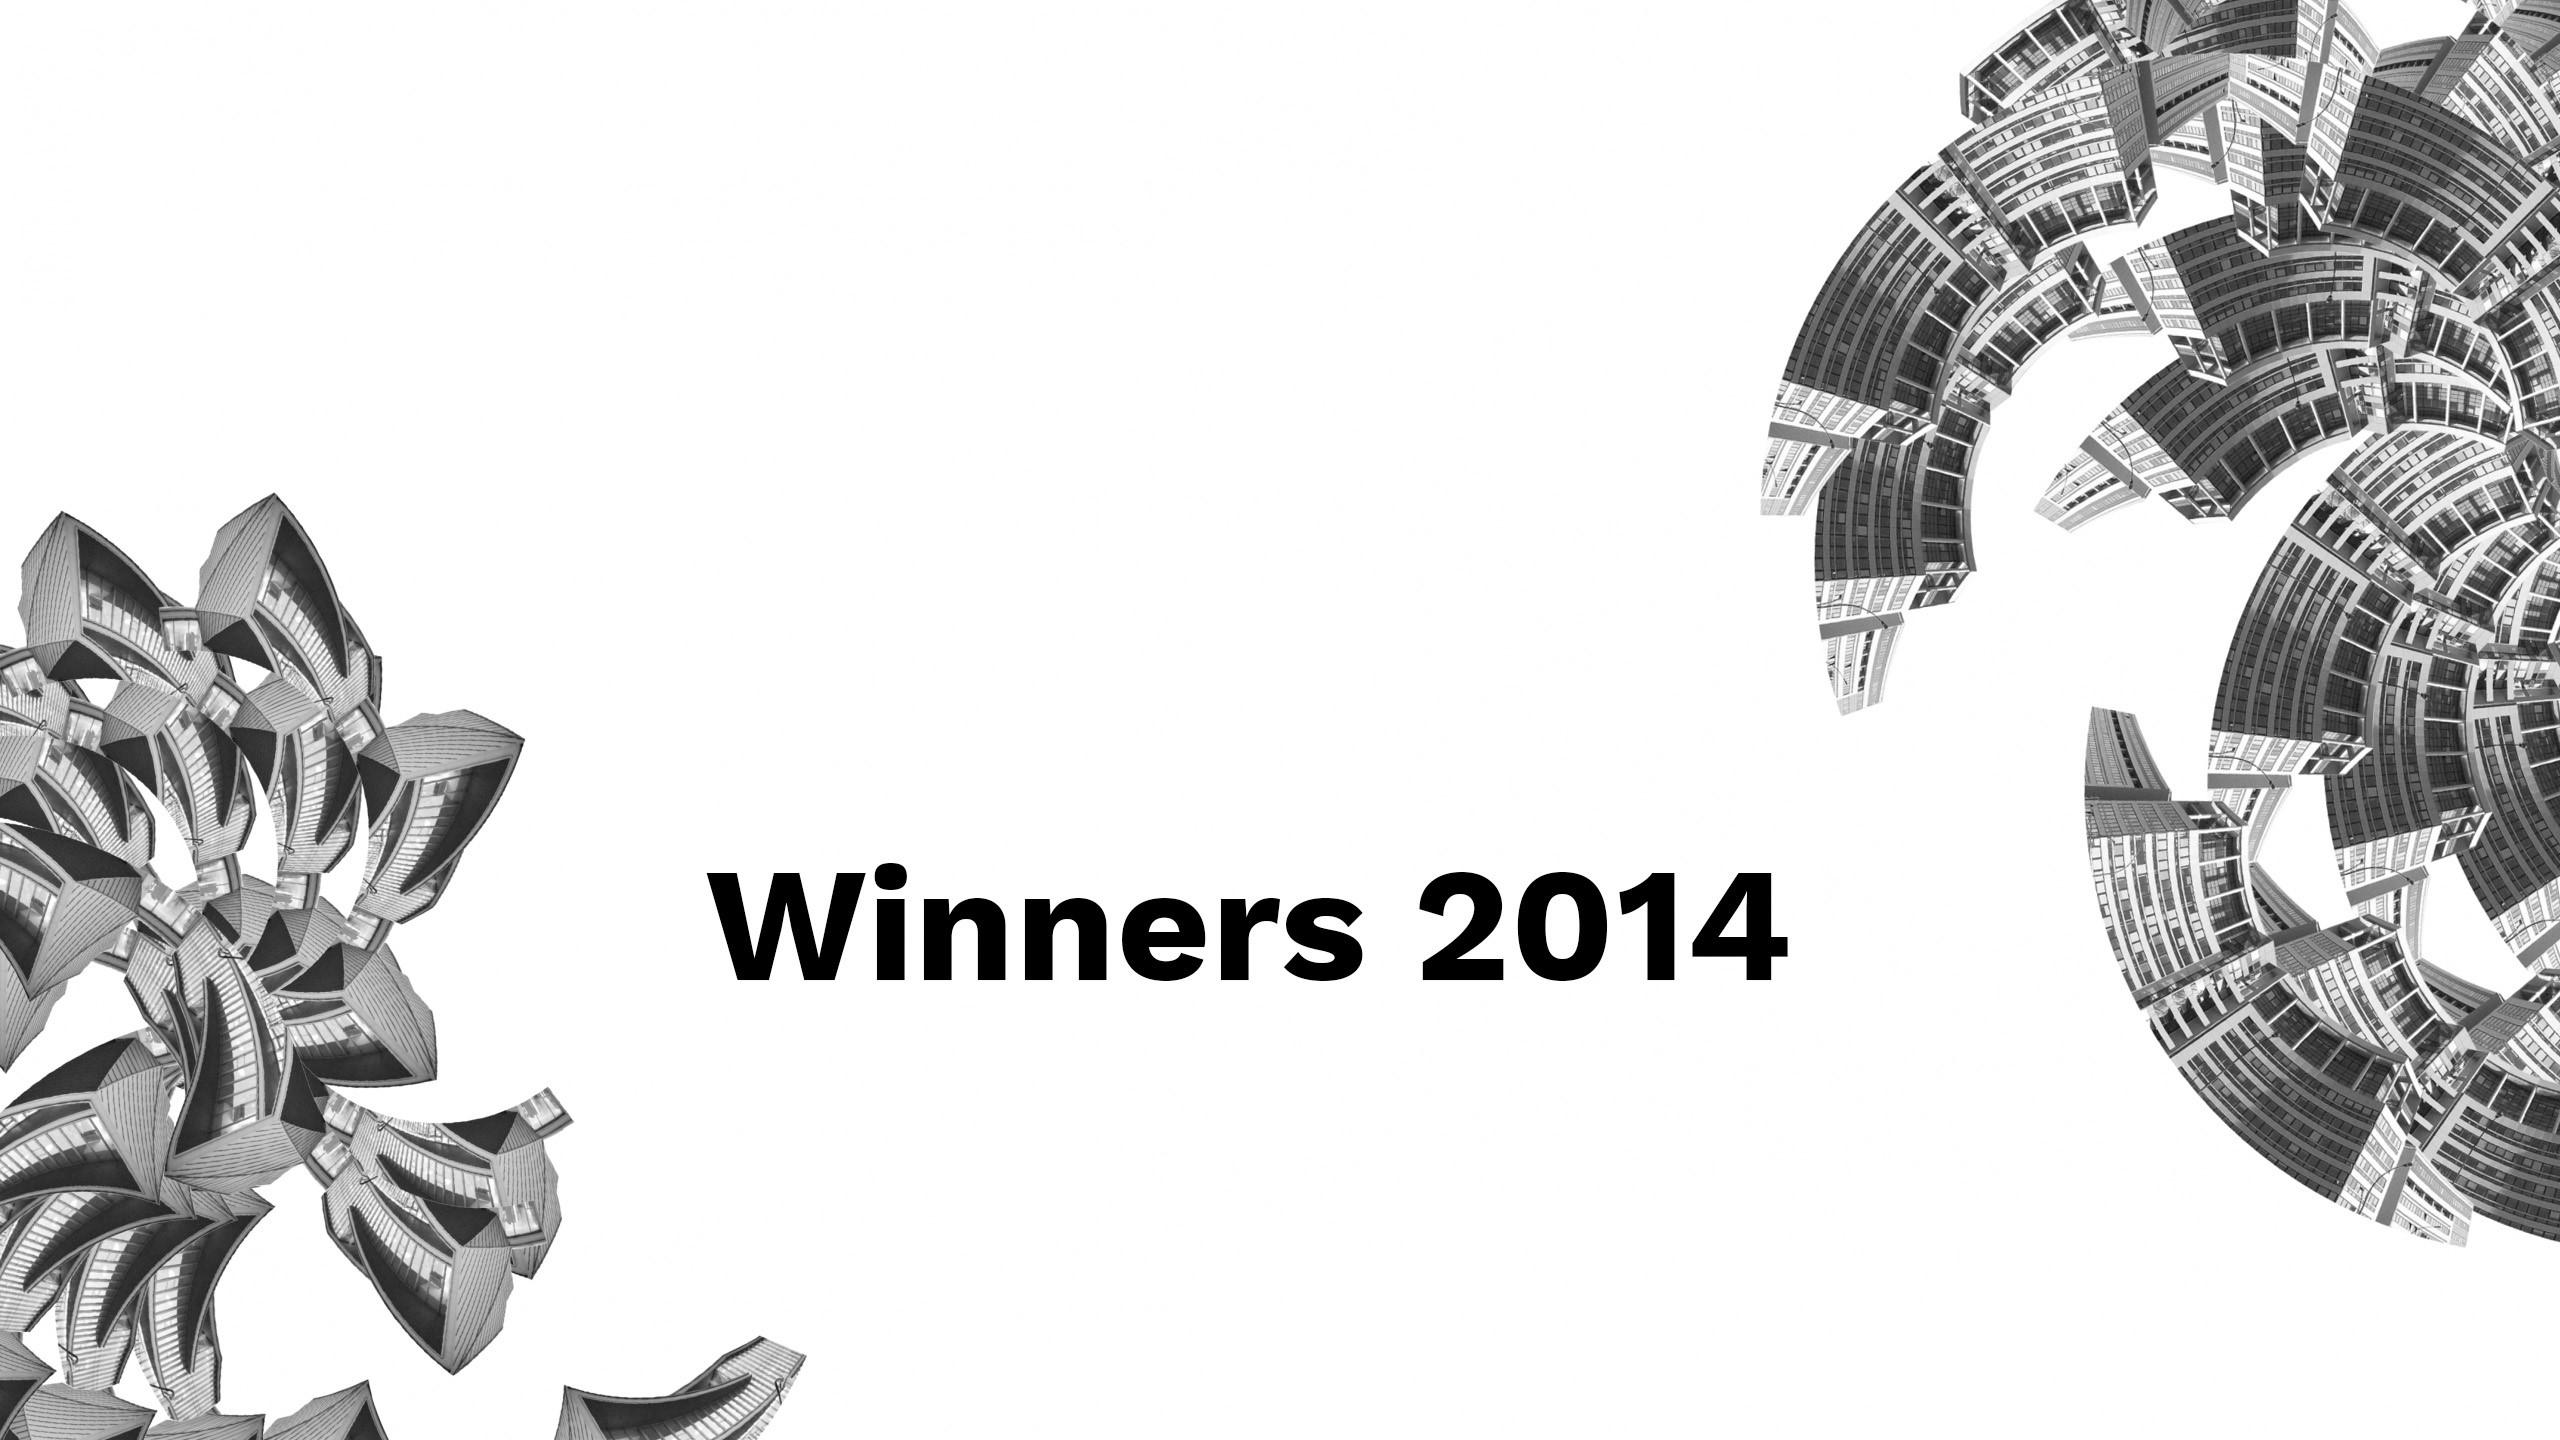 Winners 2014 Archifoto